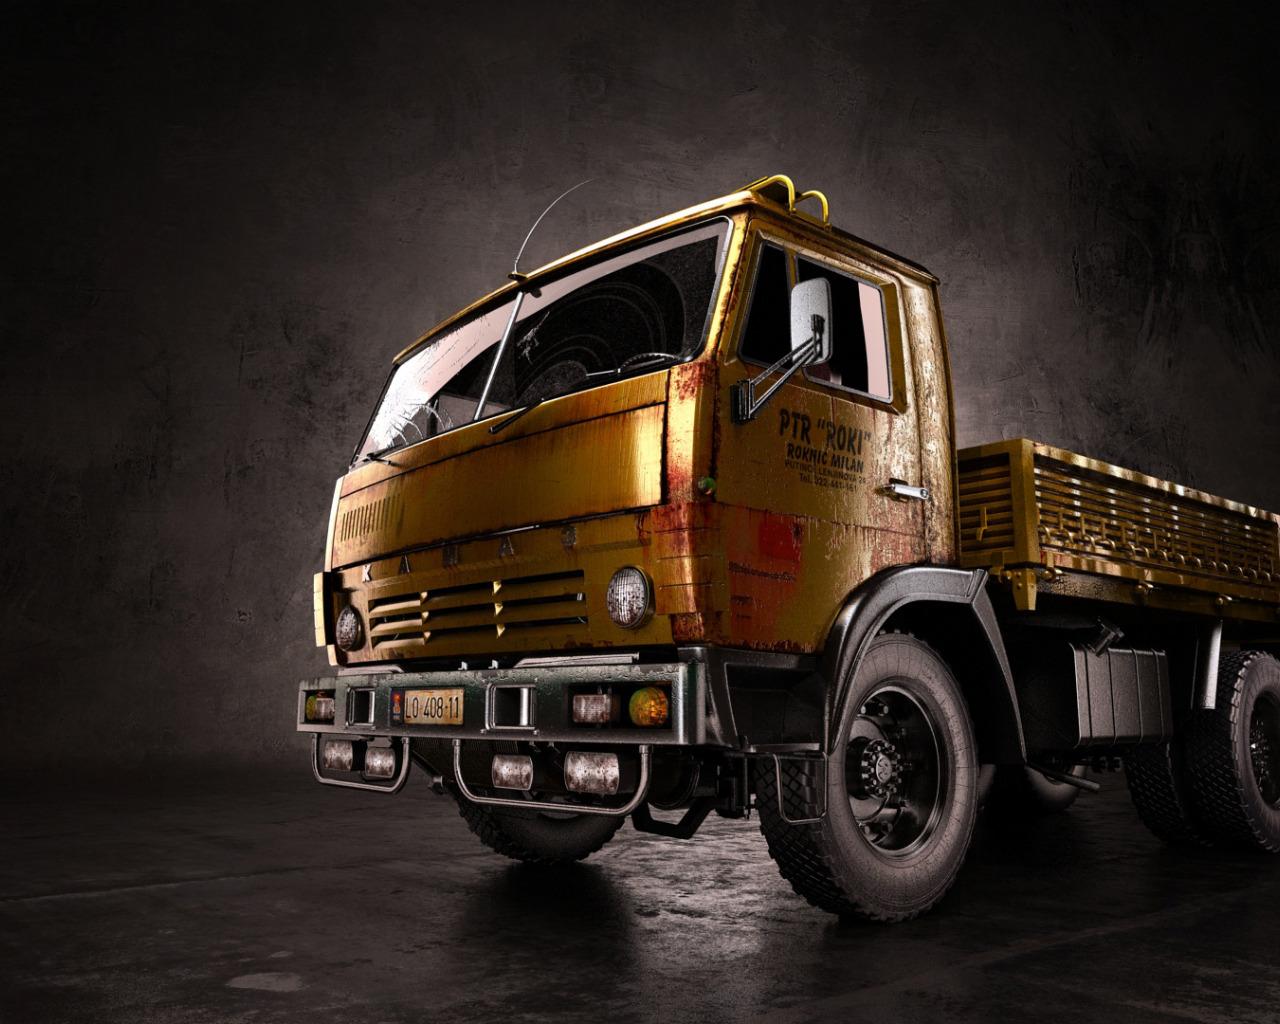 грузовики камаз фотообои слову, недавнего времени